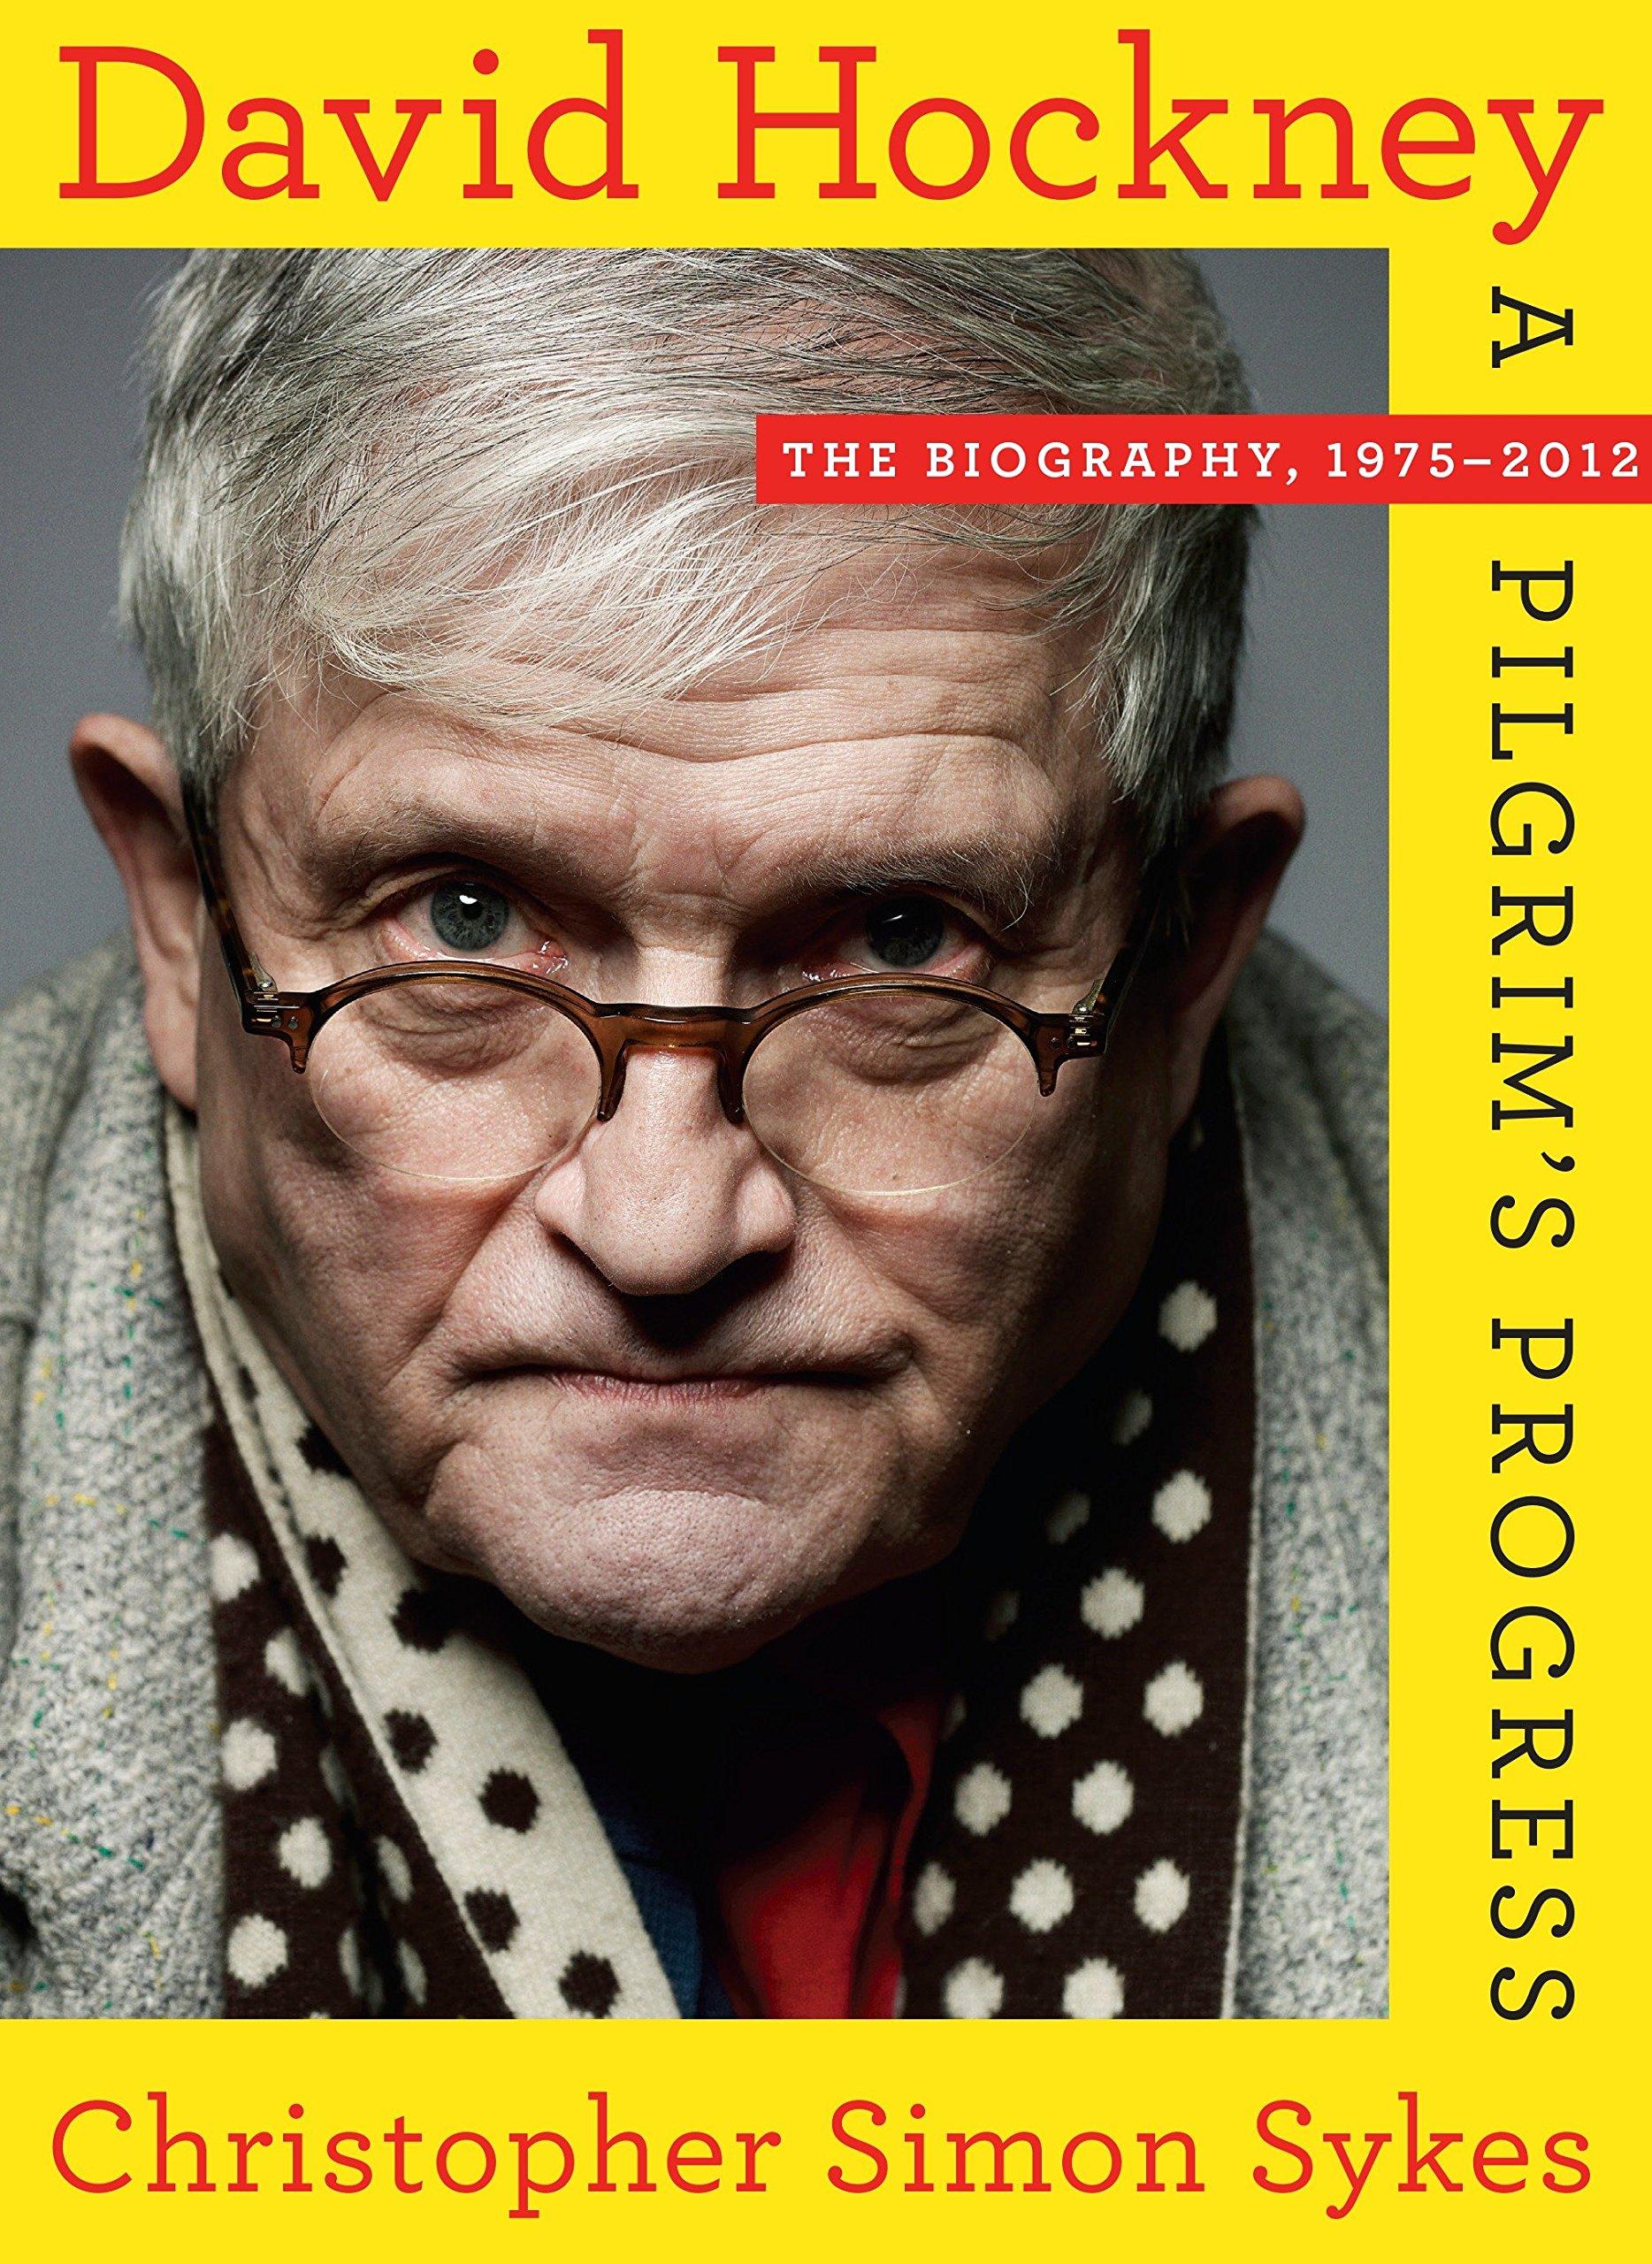 David Hockney: The Biography, 1975-2012 ebook